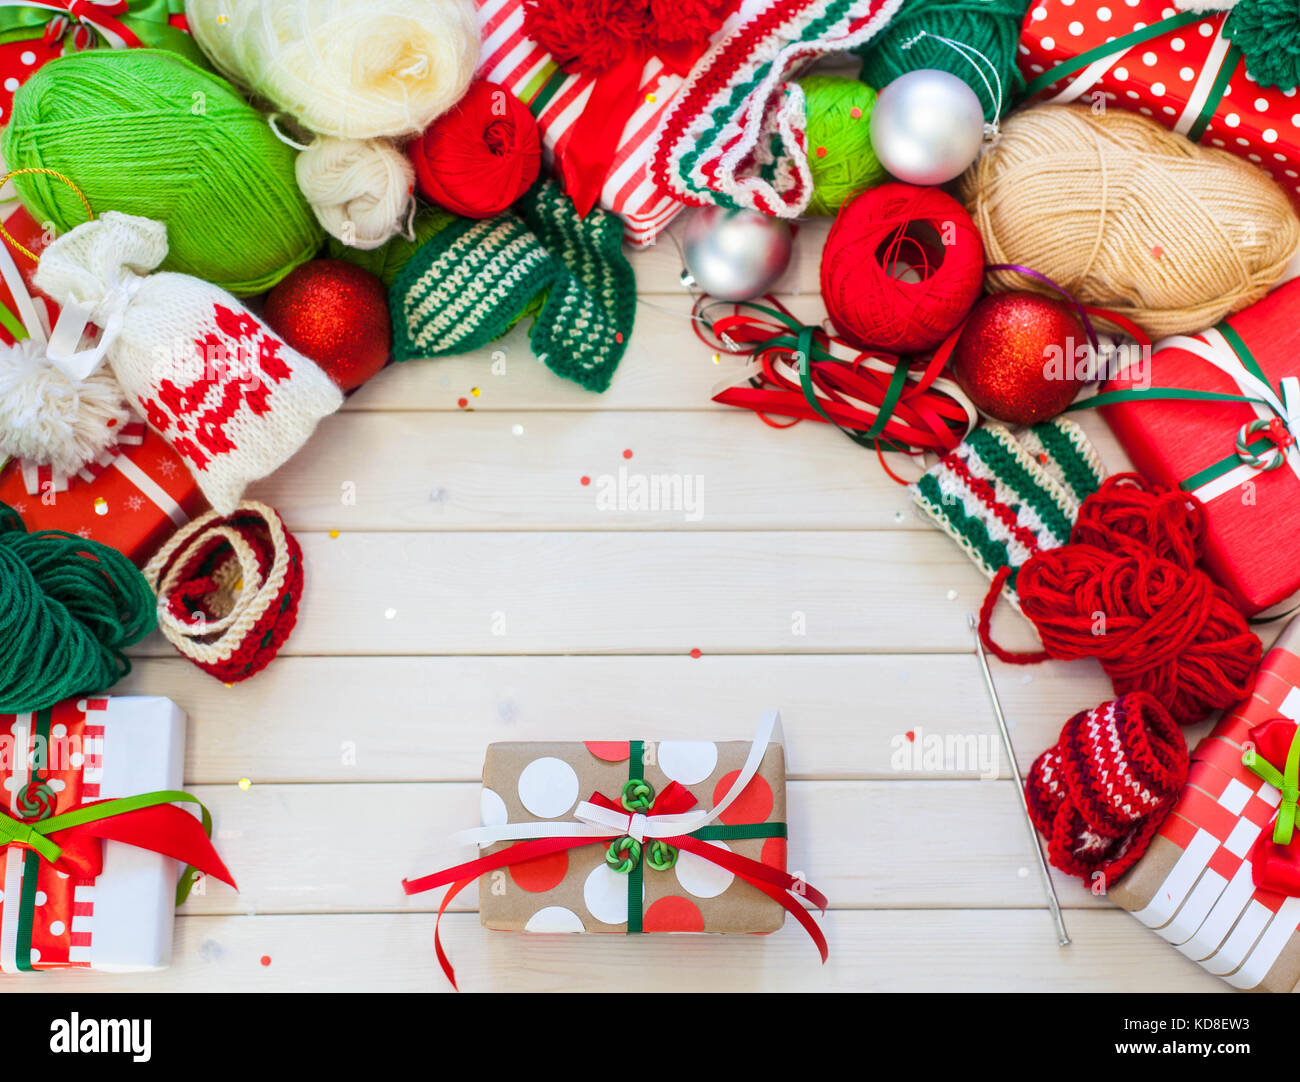 Rainbow Christmas Balls Imágenes De Stock & Rainbow Christmas Balls ...